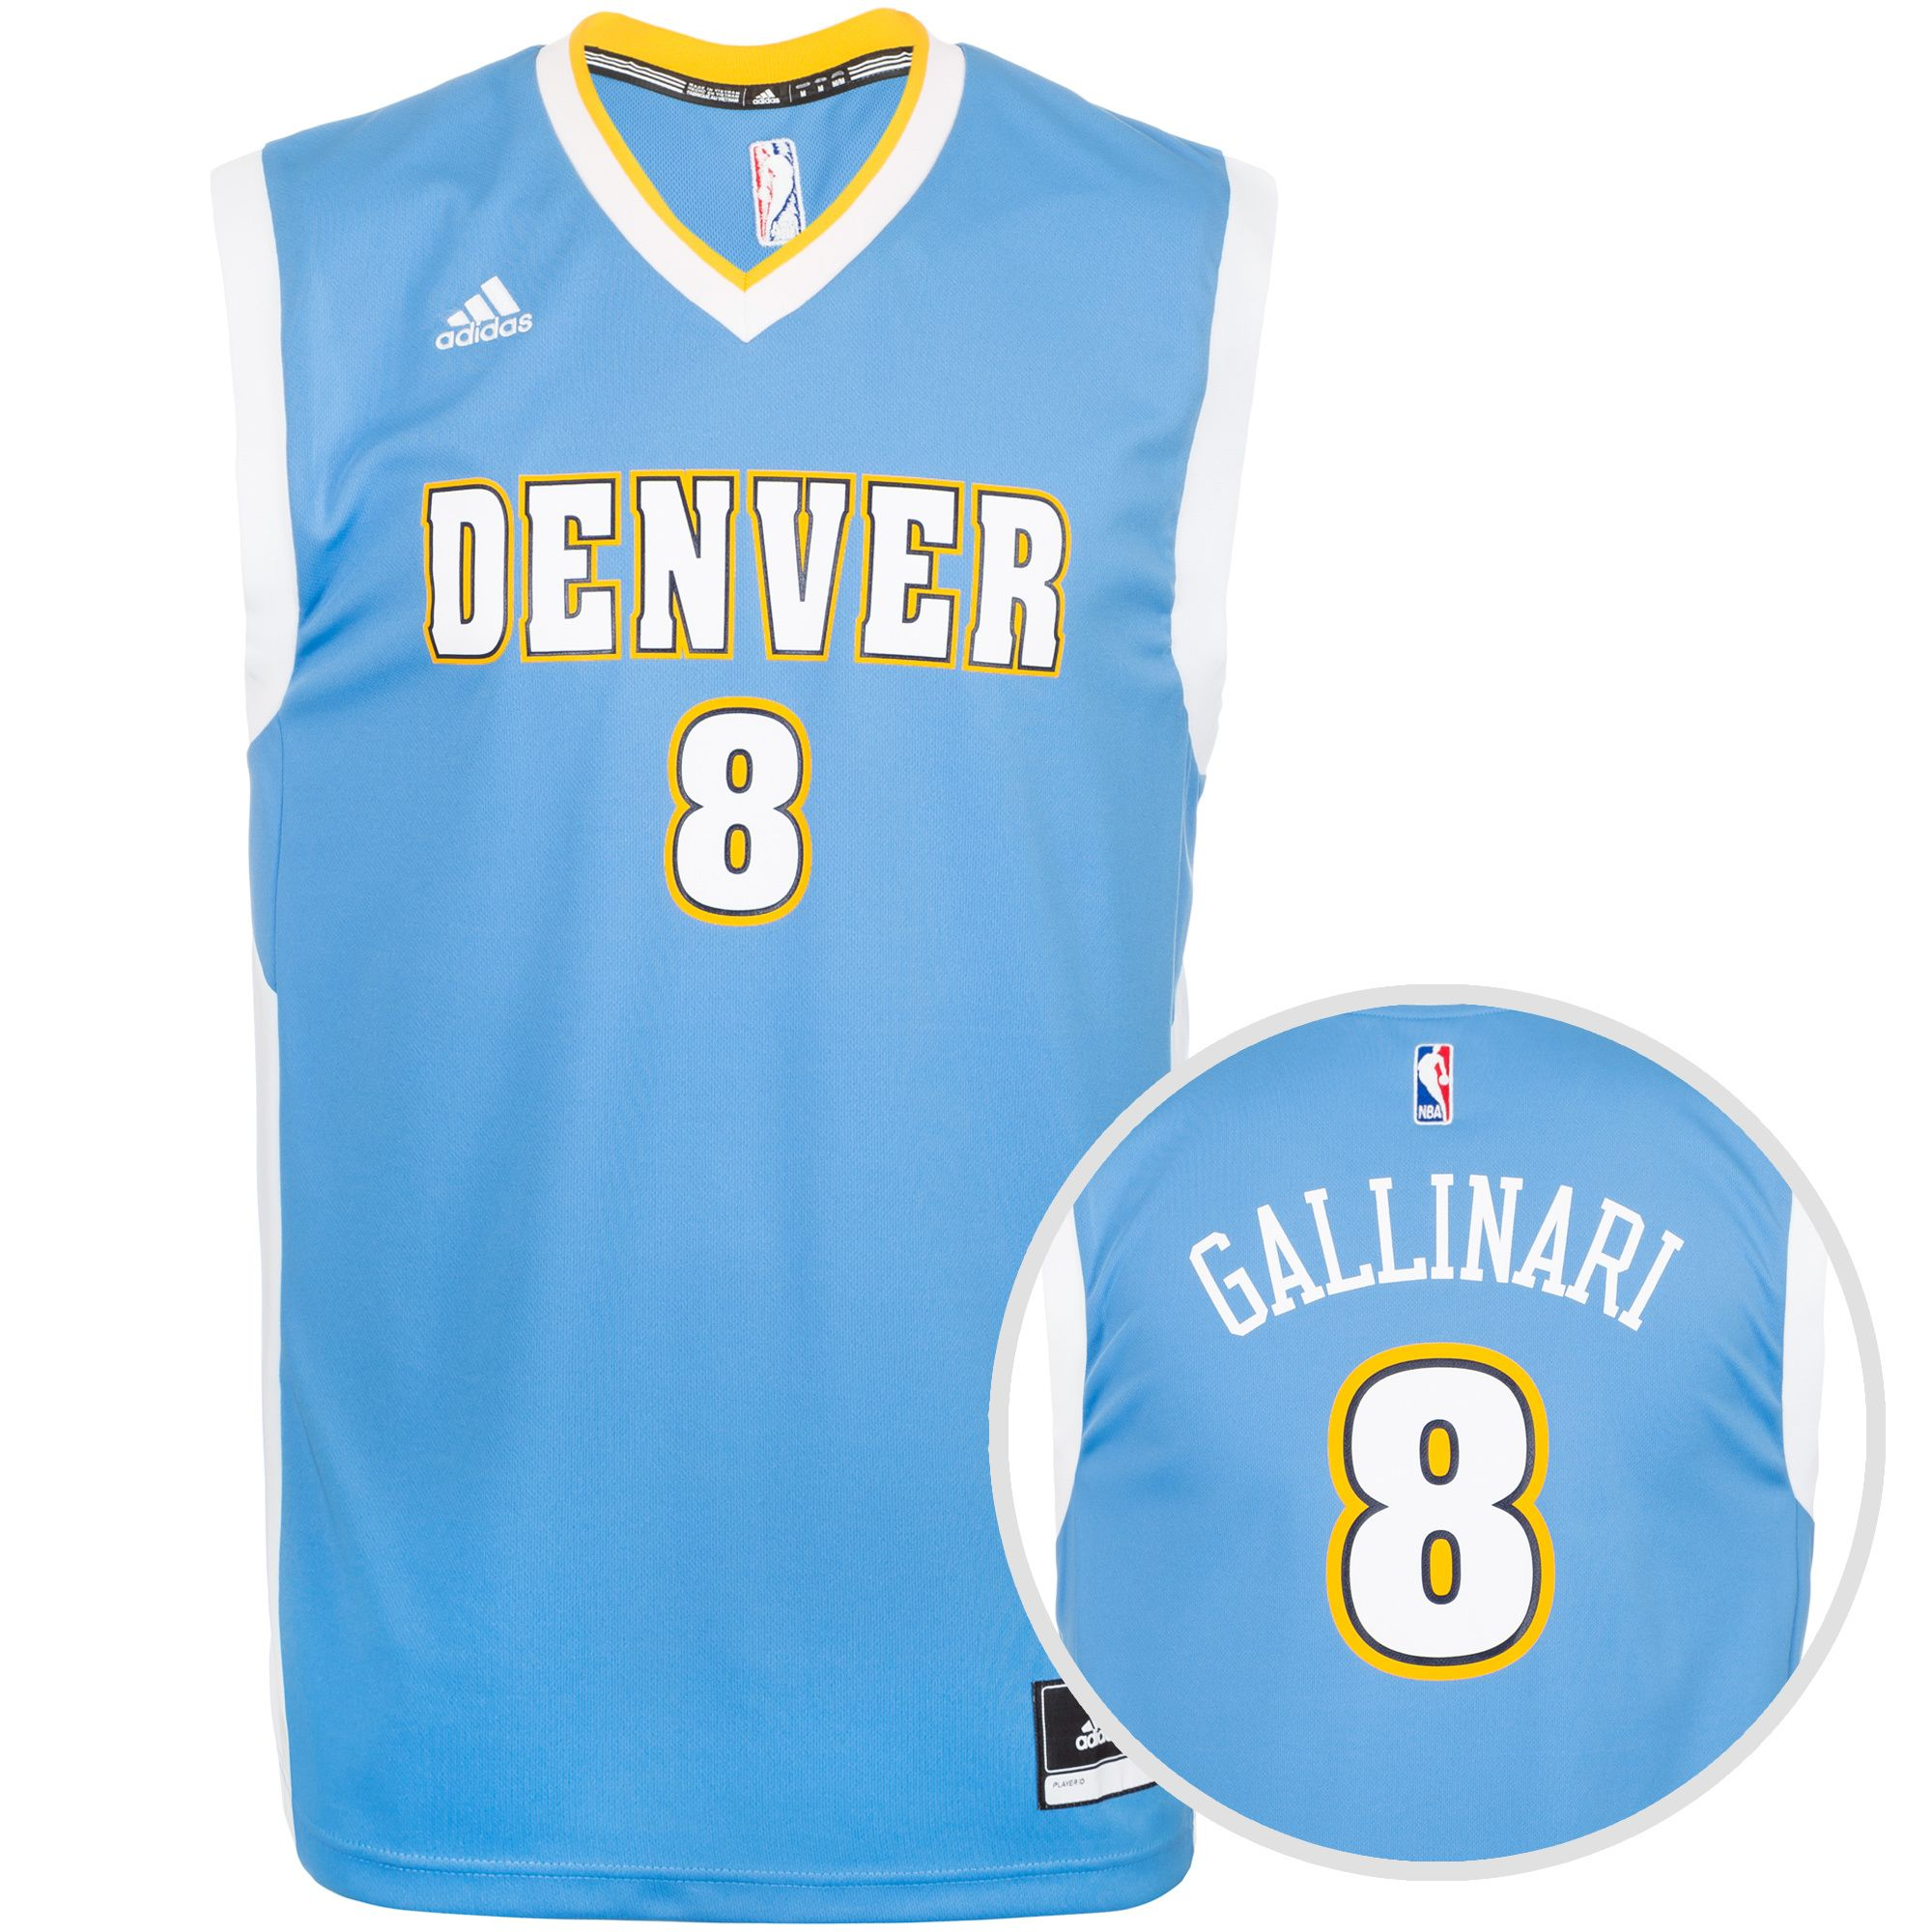 ADIDAS PERFORMANCE adidas Performance Denver Nuggets Gallinari Replica Basketballtrikot Herren